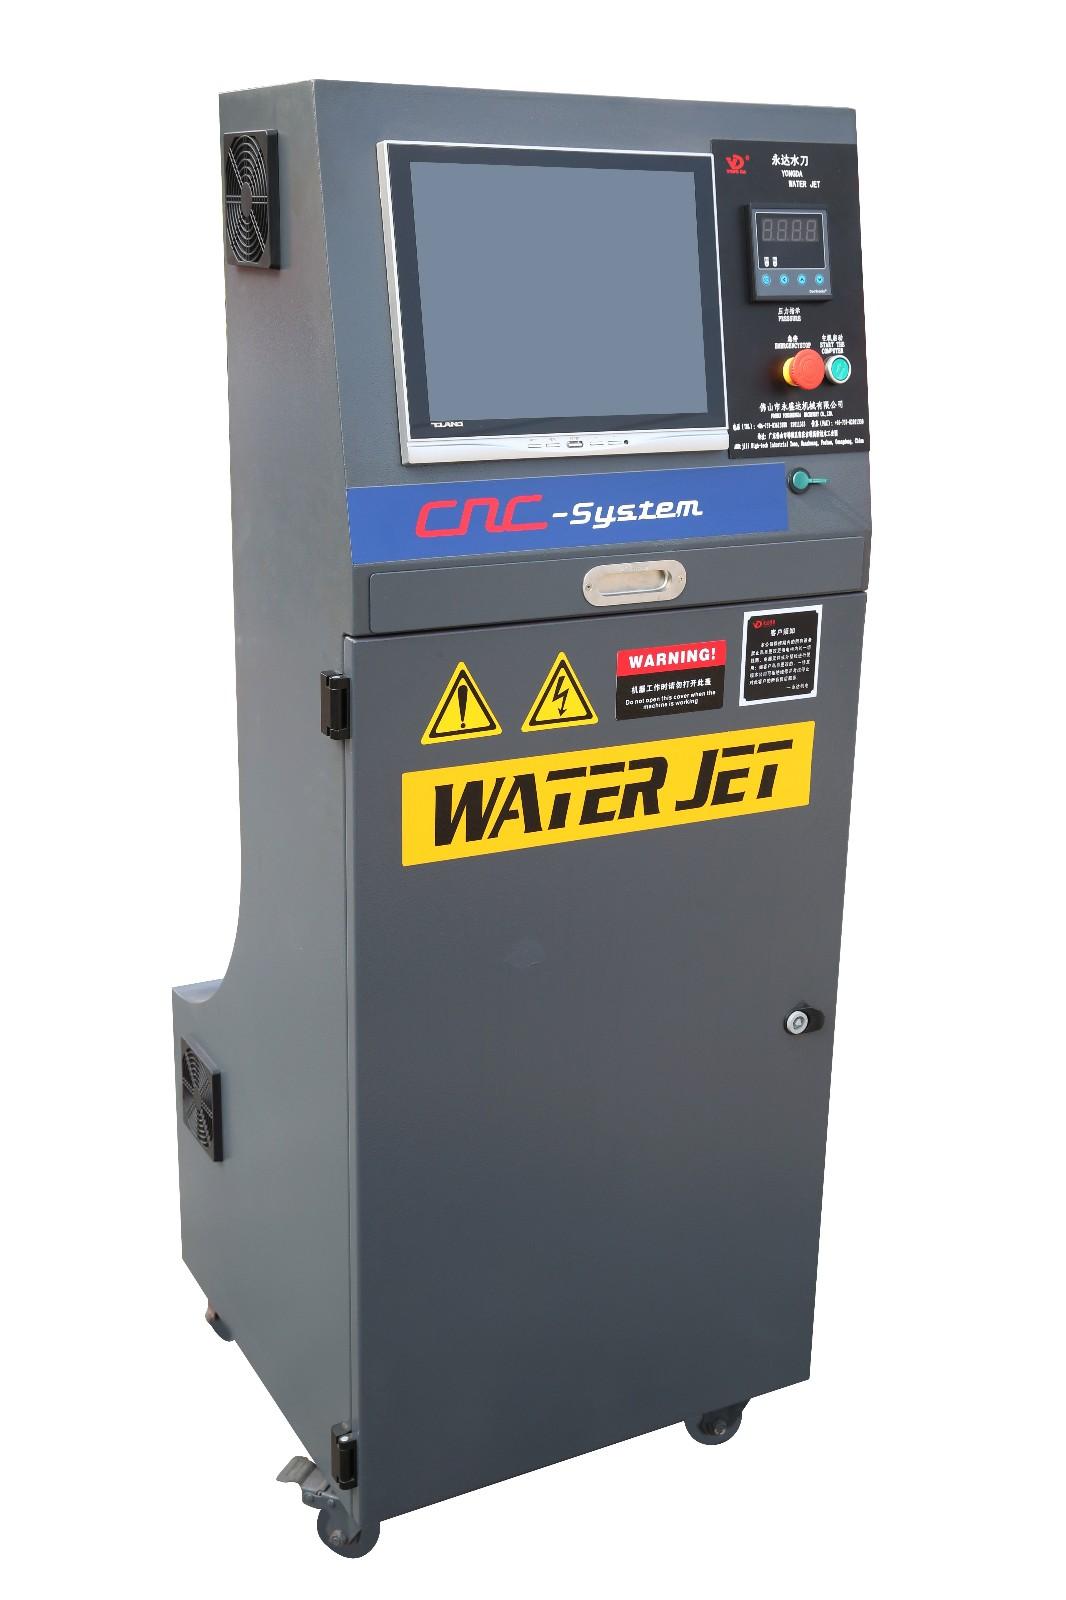 YONGDA-Yongda water jet faster cutting speed, higher return on investment-5